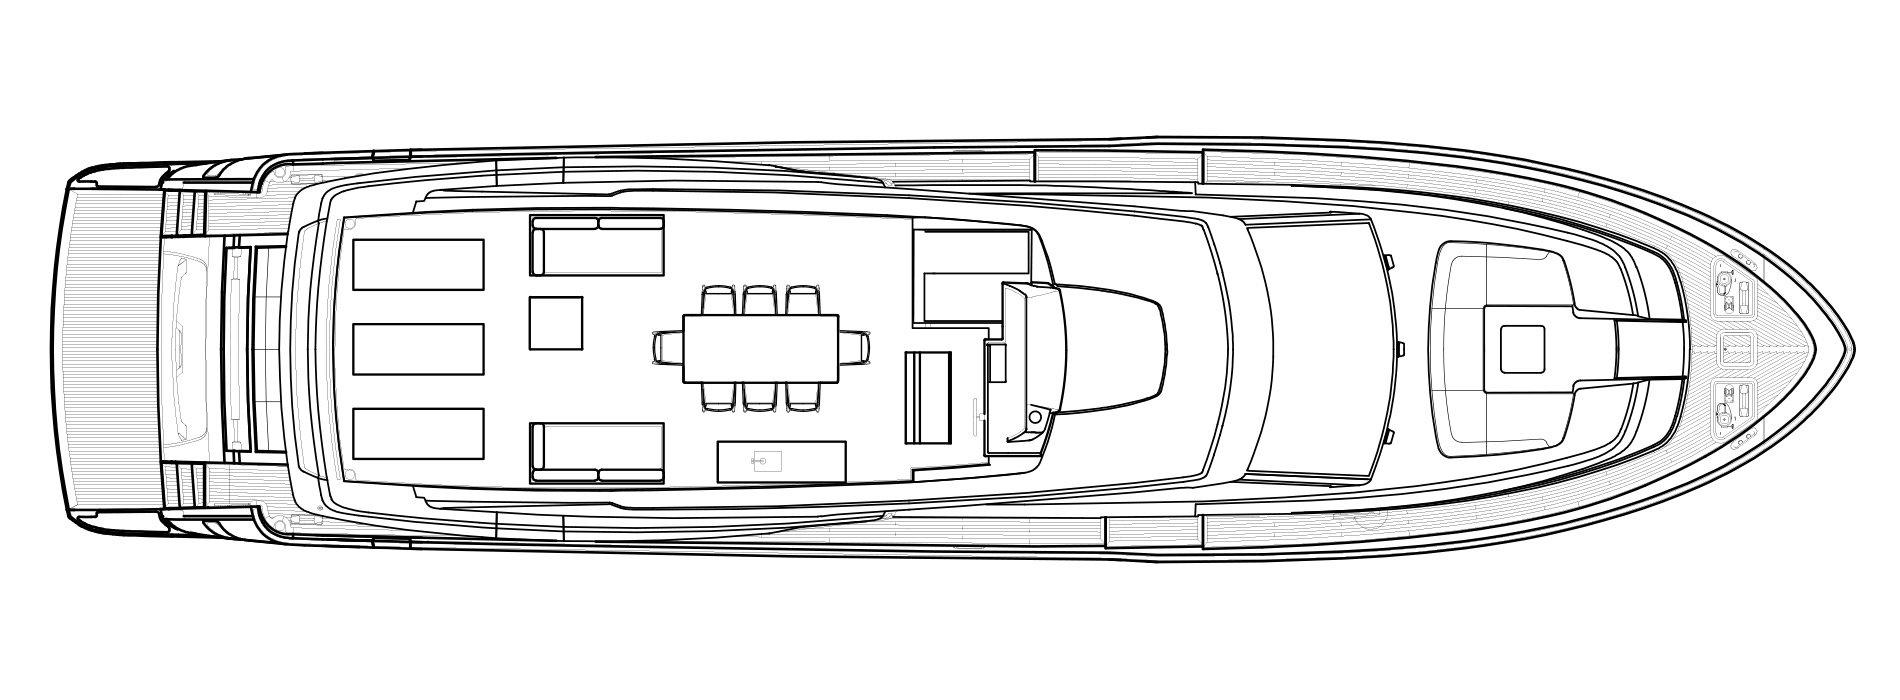 Sanlorenzo Yachts SL86 Флайбридж версия USA